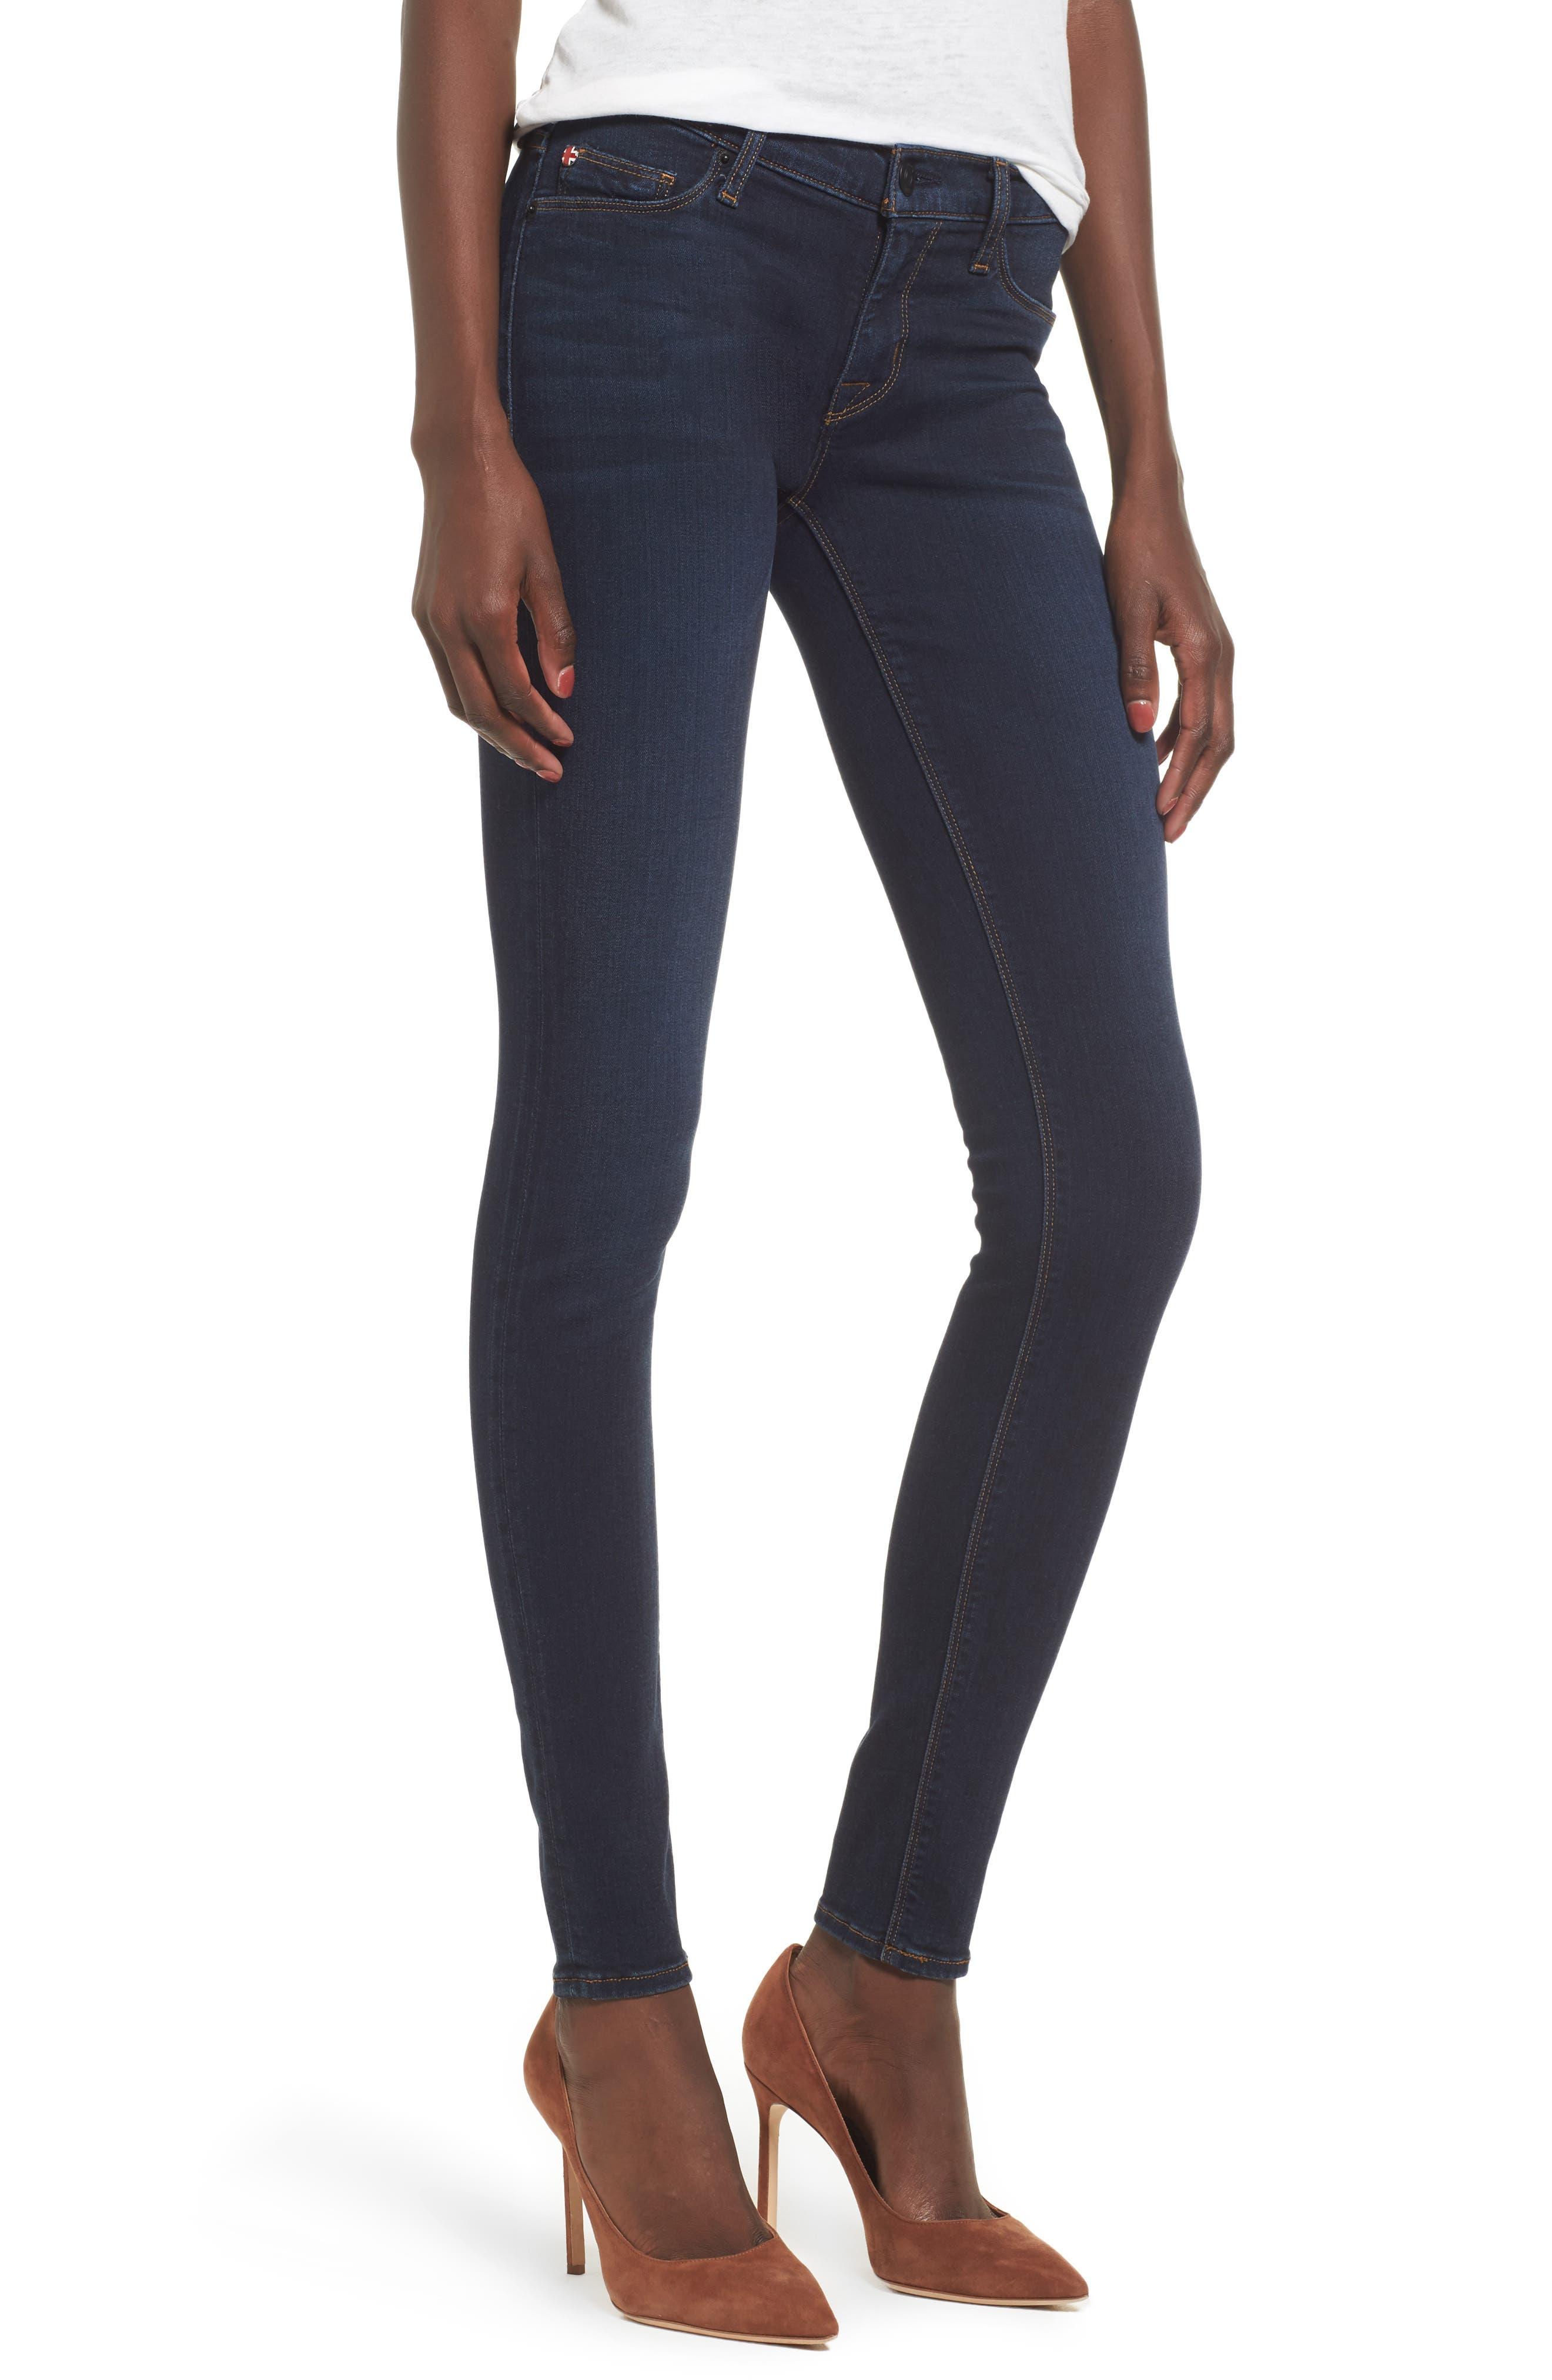 Main Image - Hudson Jeans 'Krista' Super Skinny Jeans (Skylark)